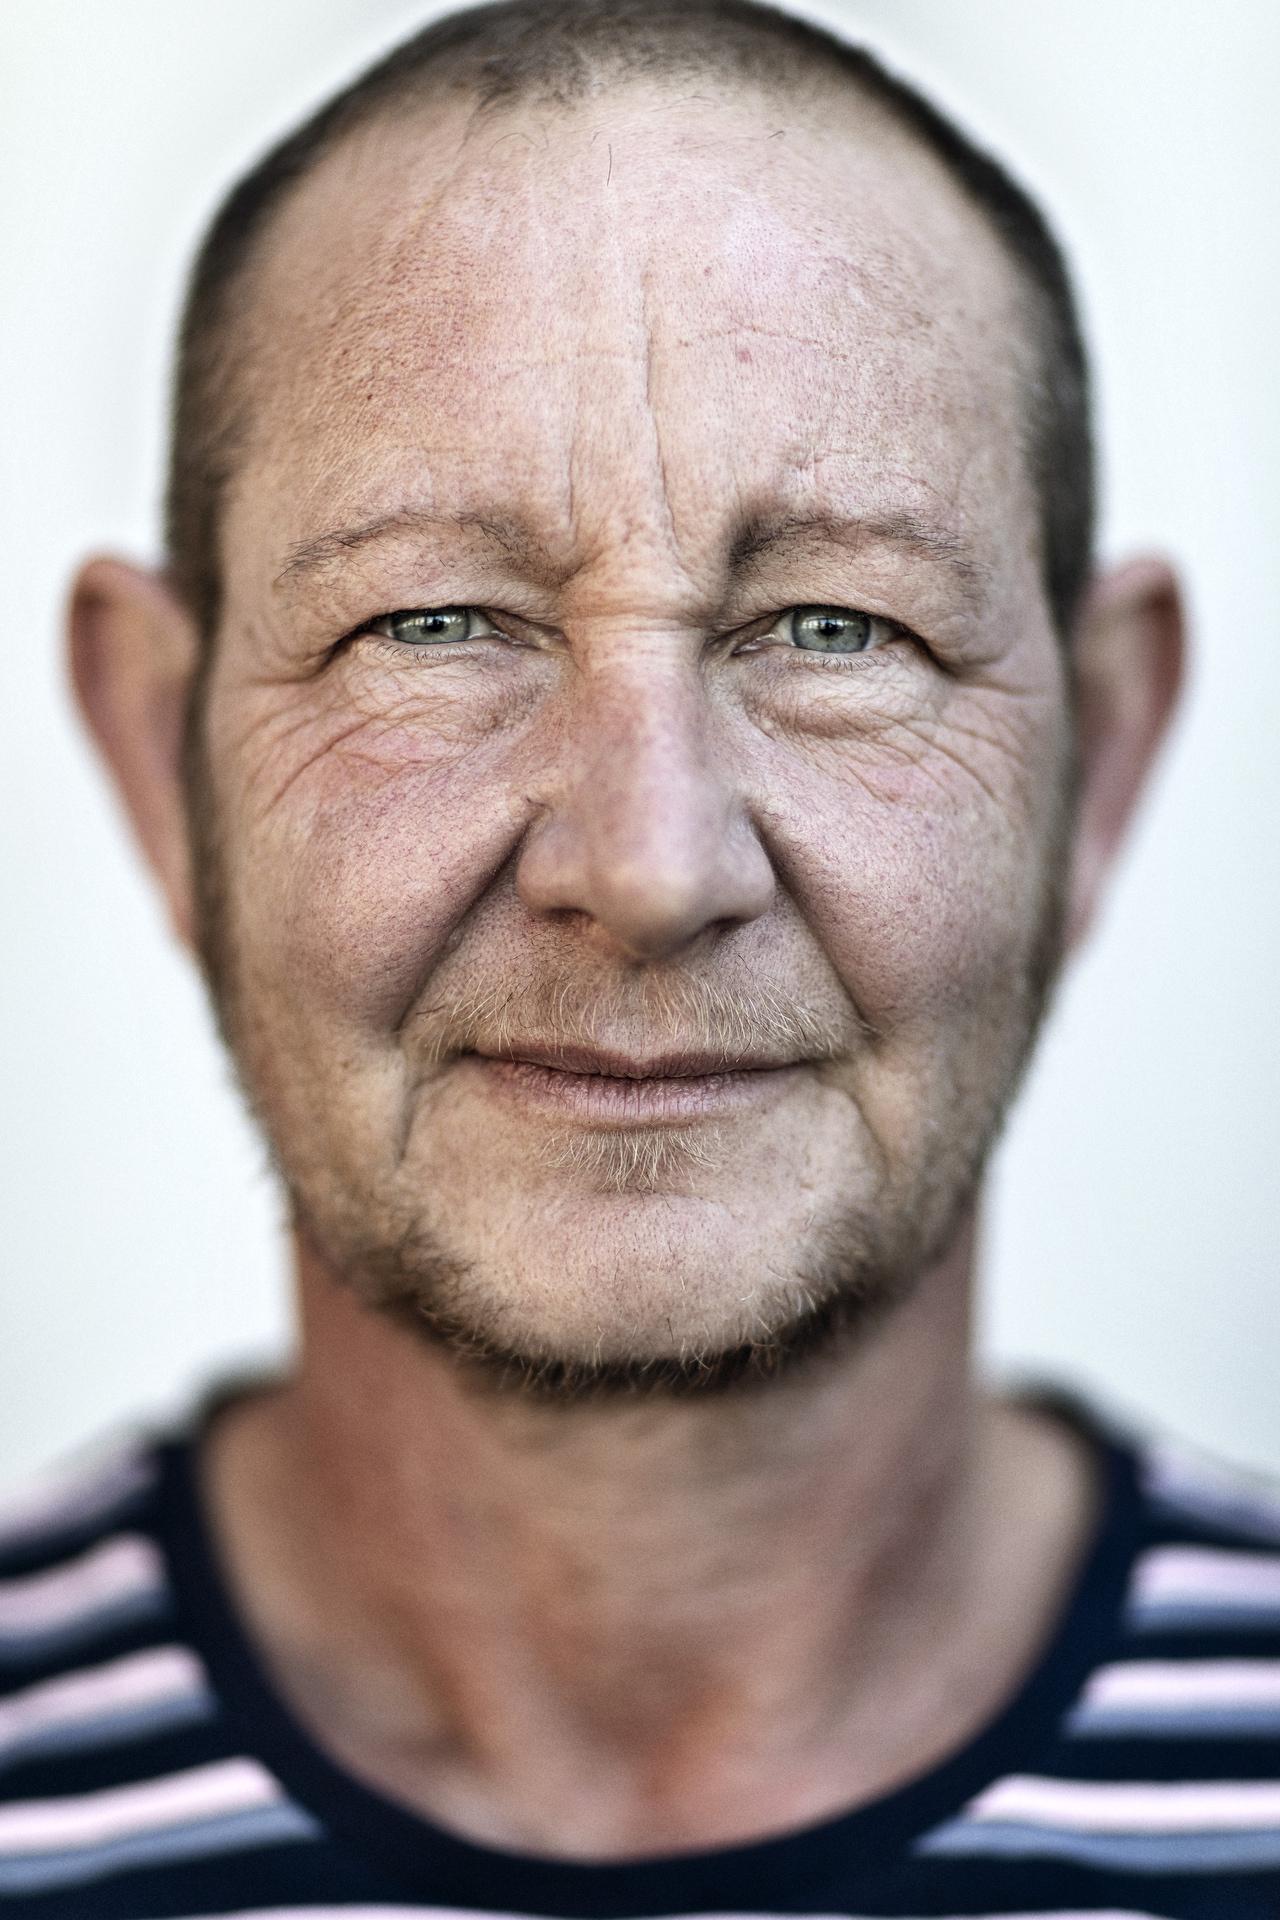 Sydney portrait photographer, personal branding, Eye2Eye, actor, headshots, corporate photography, corporate headshots, portraits, head shots